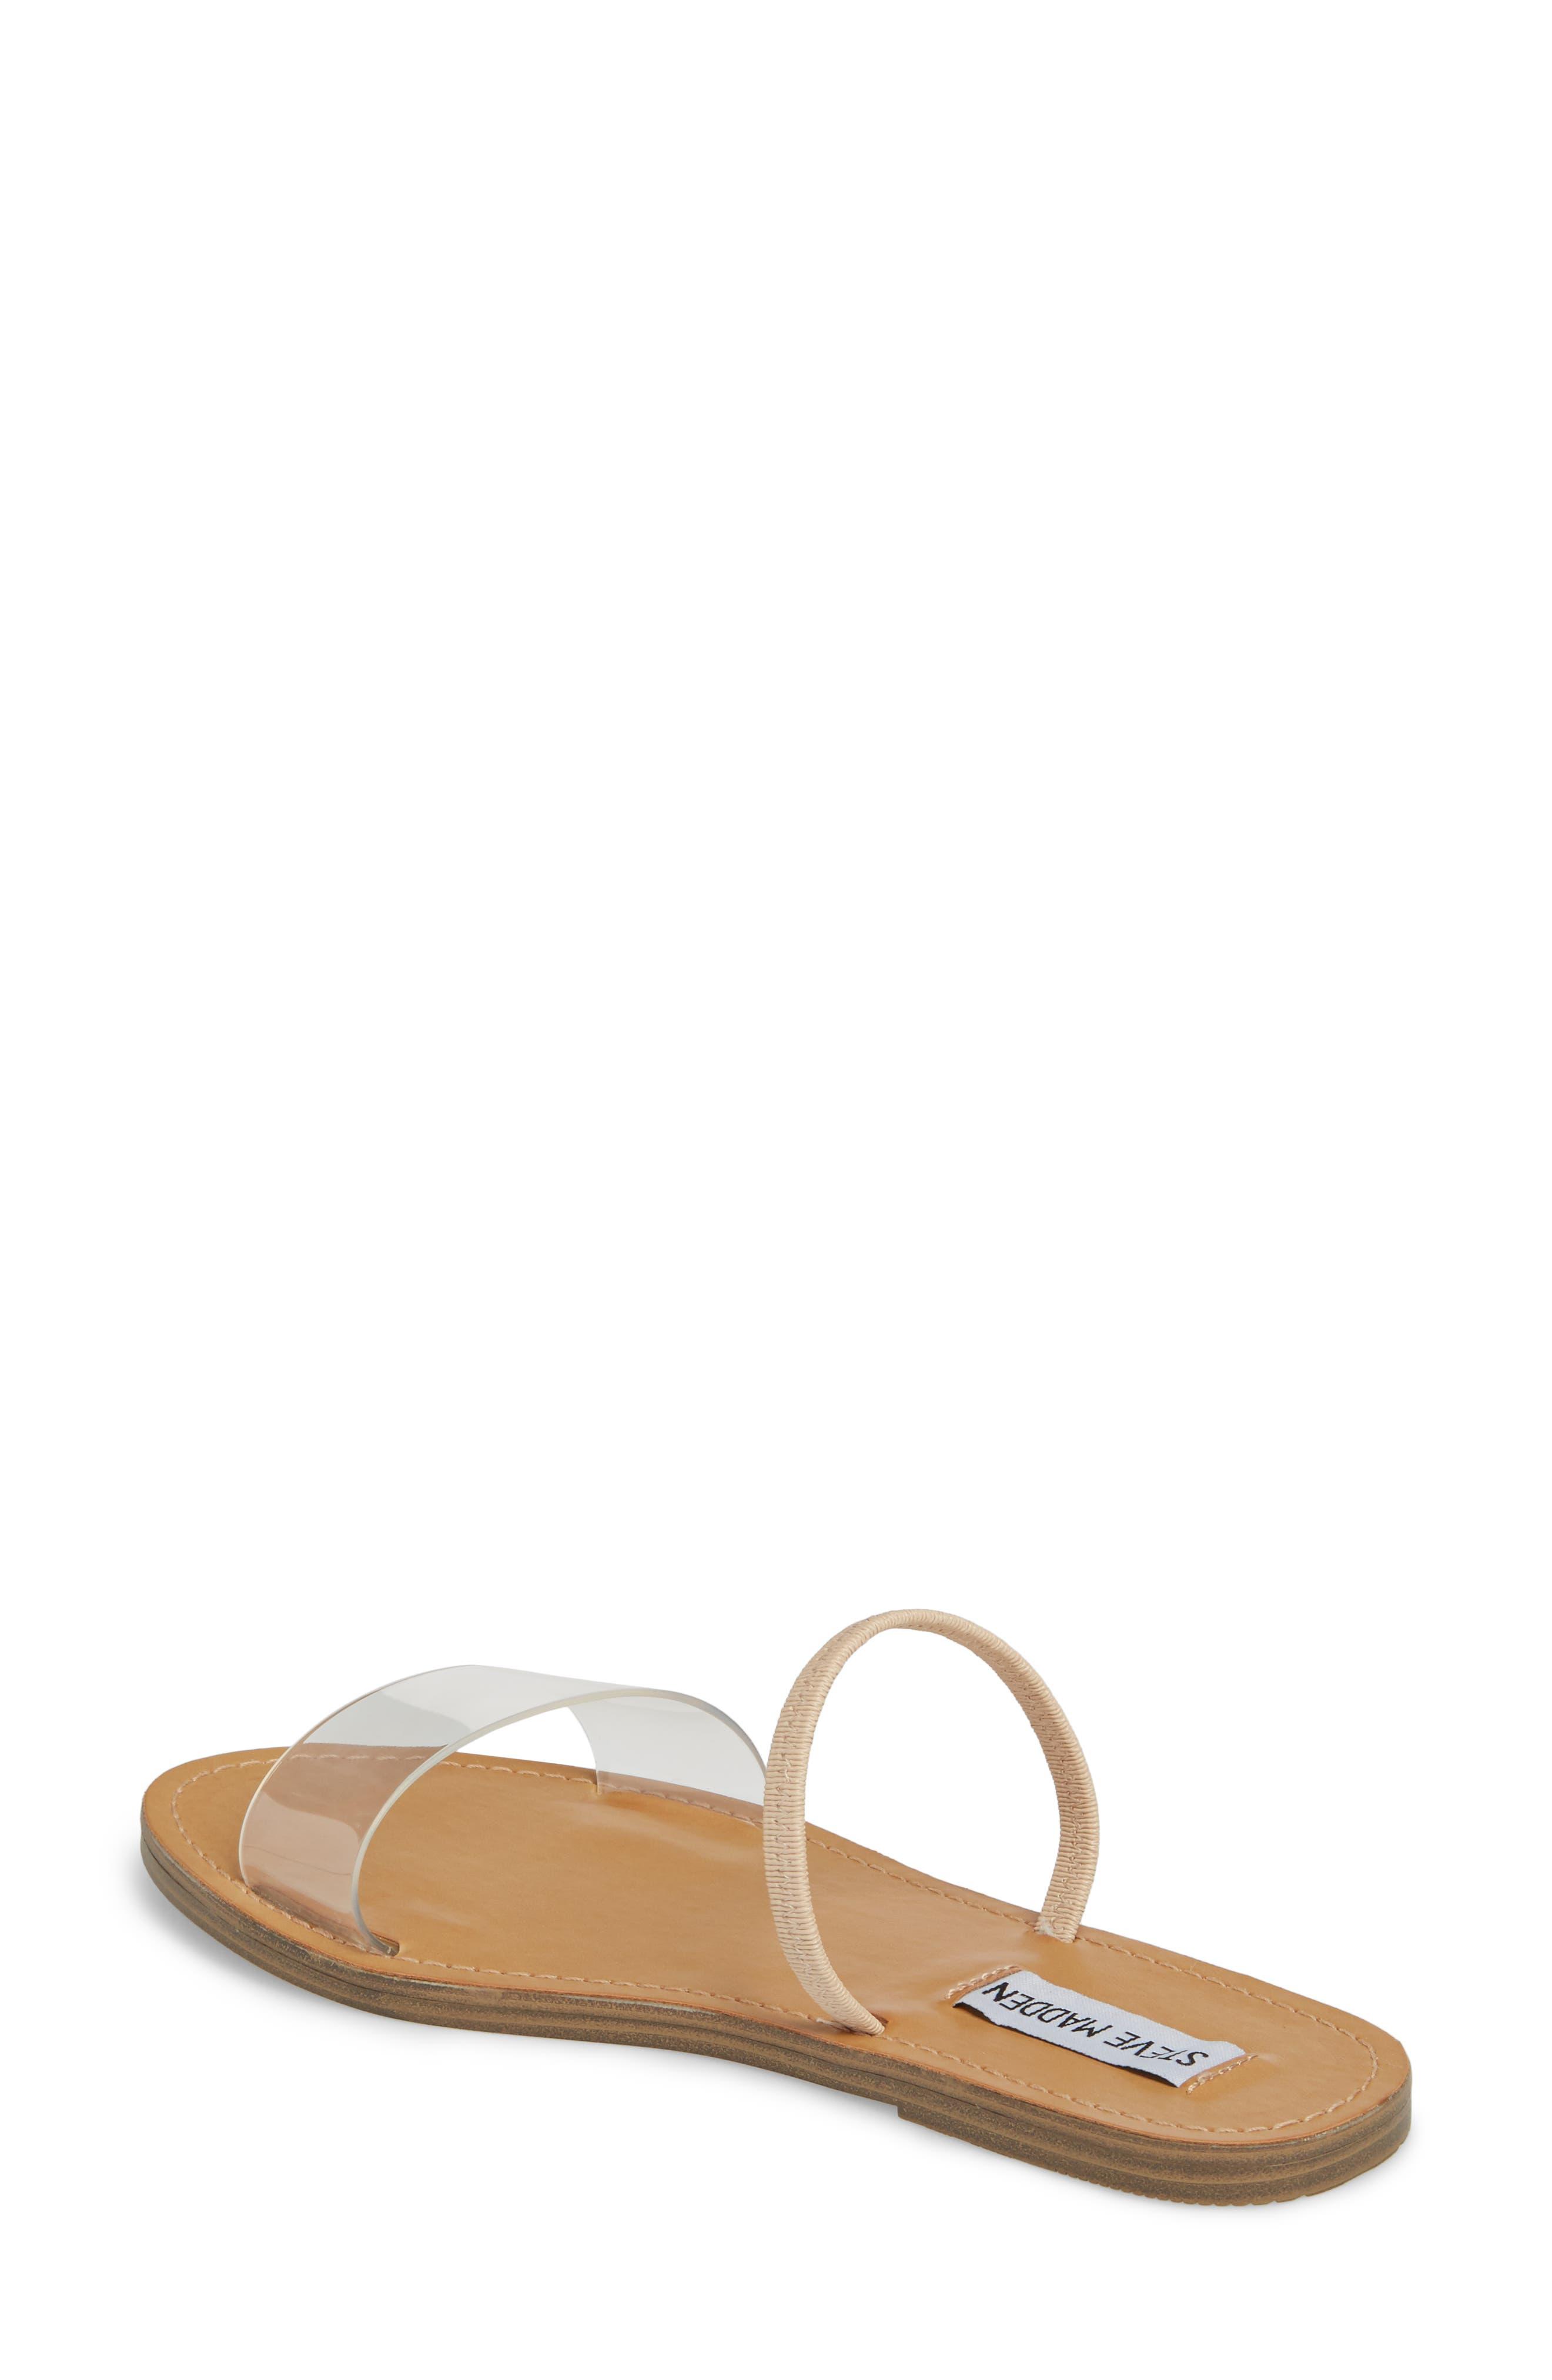 Dasha Strappy Slide Sandal,                             Alternate thumbnail 8, color,